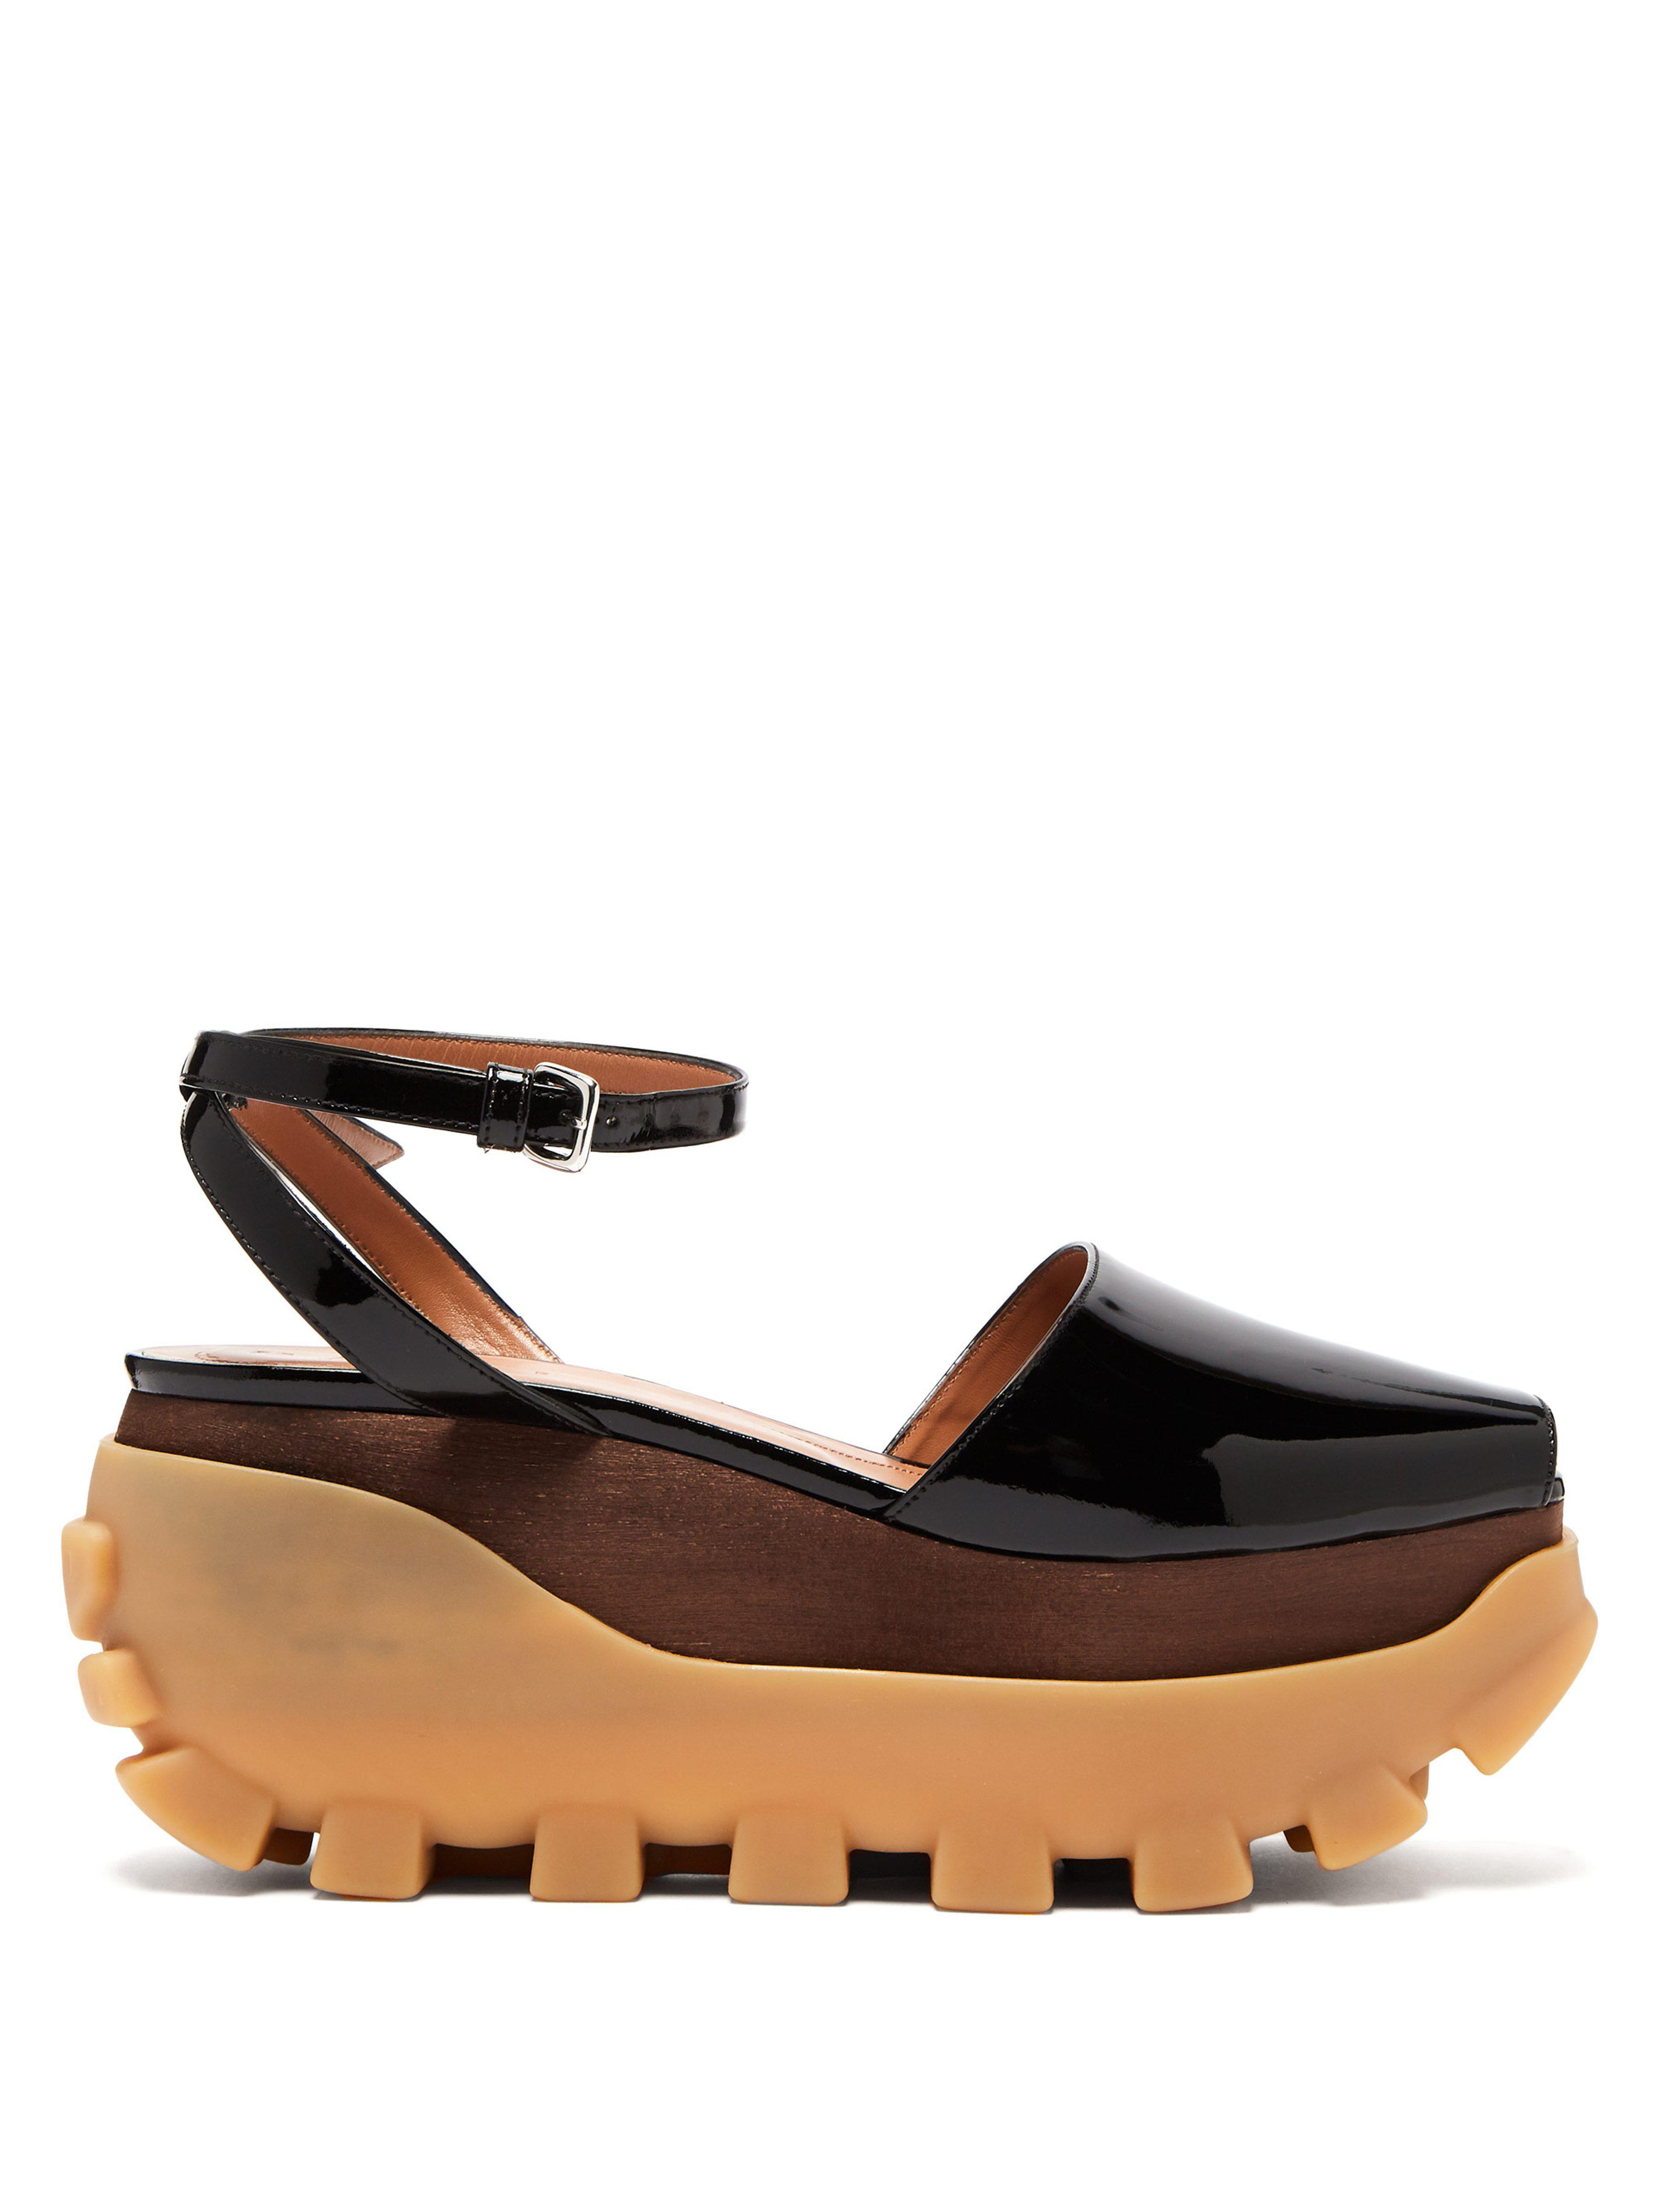 46c40974a396 Marni Wooden Flatform Sandals in Black - Lyst